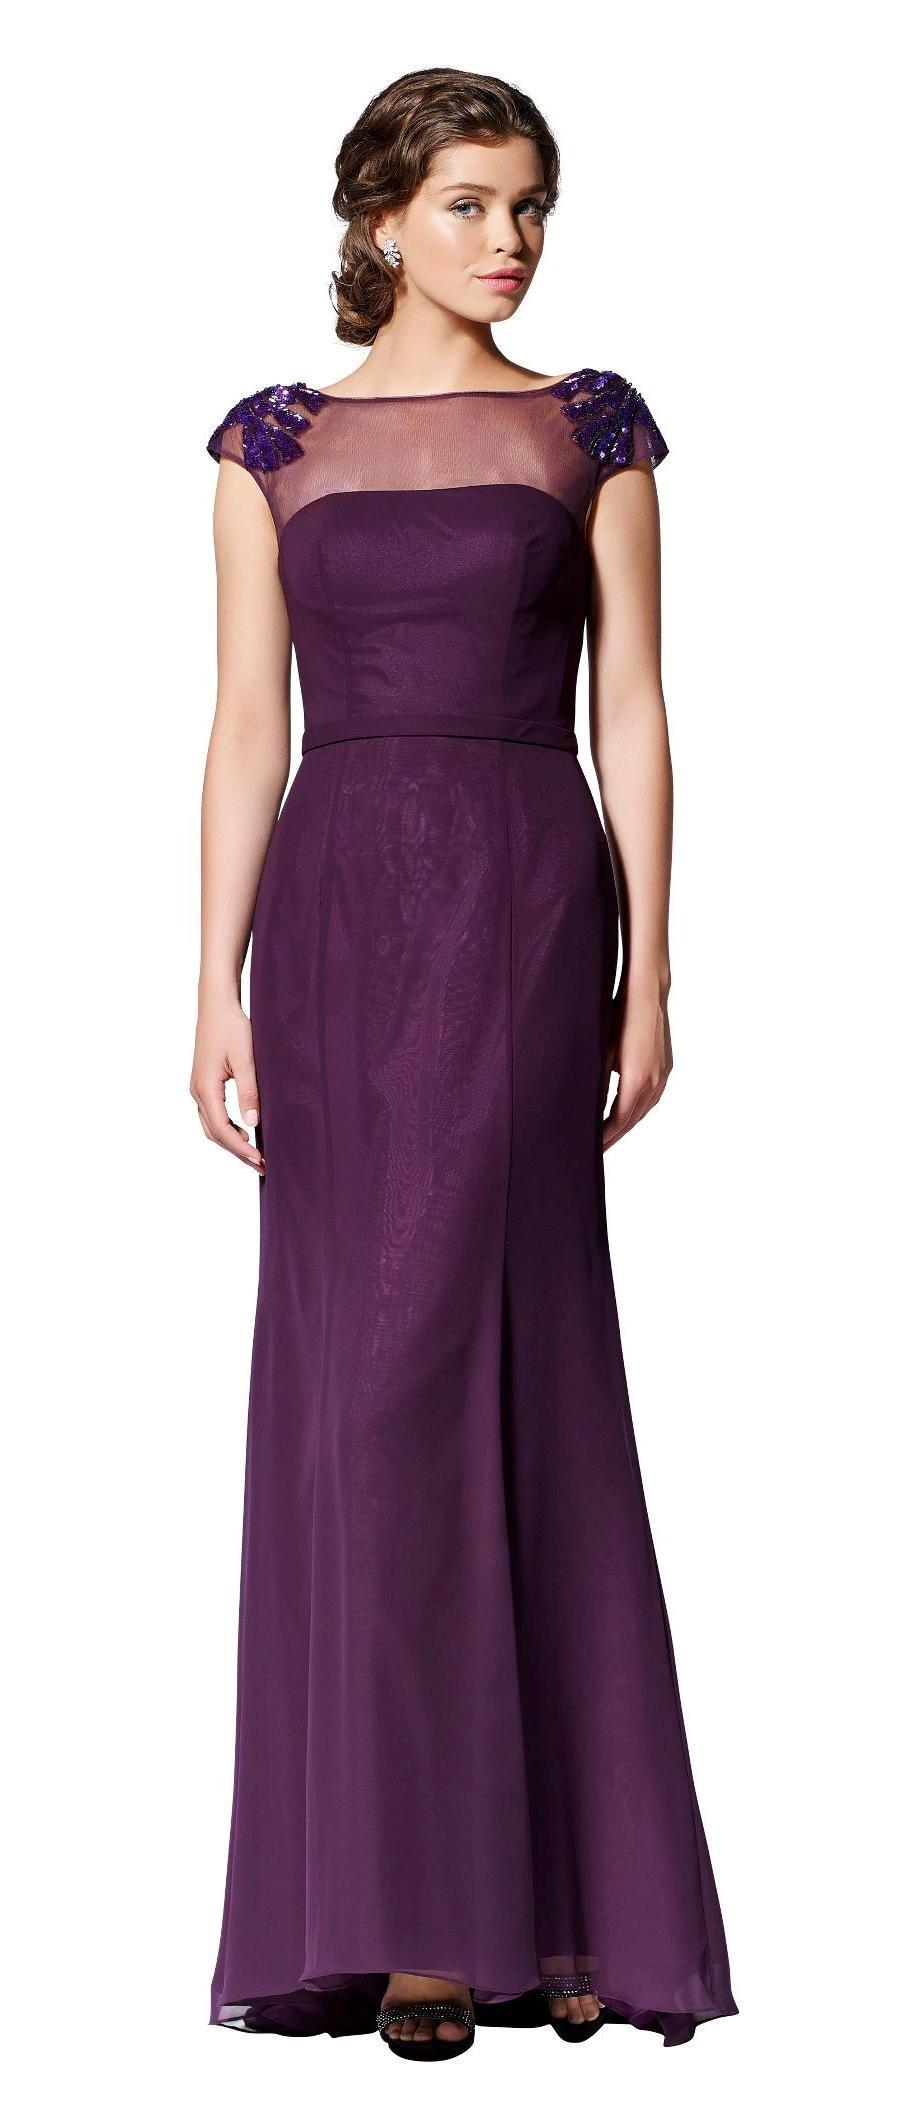 15 Luxus Abendkleid Verleih Galerie13 Großartig Abendkleid Verleih Spezialgebiet